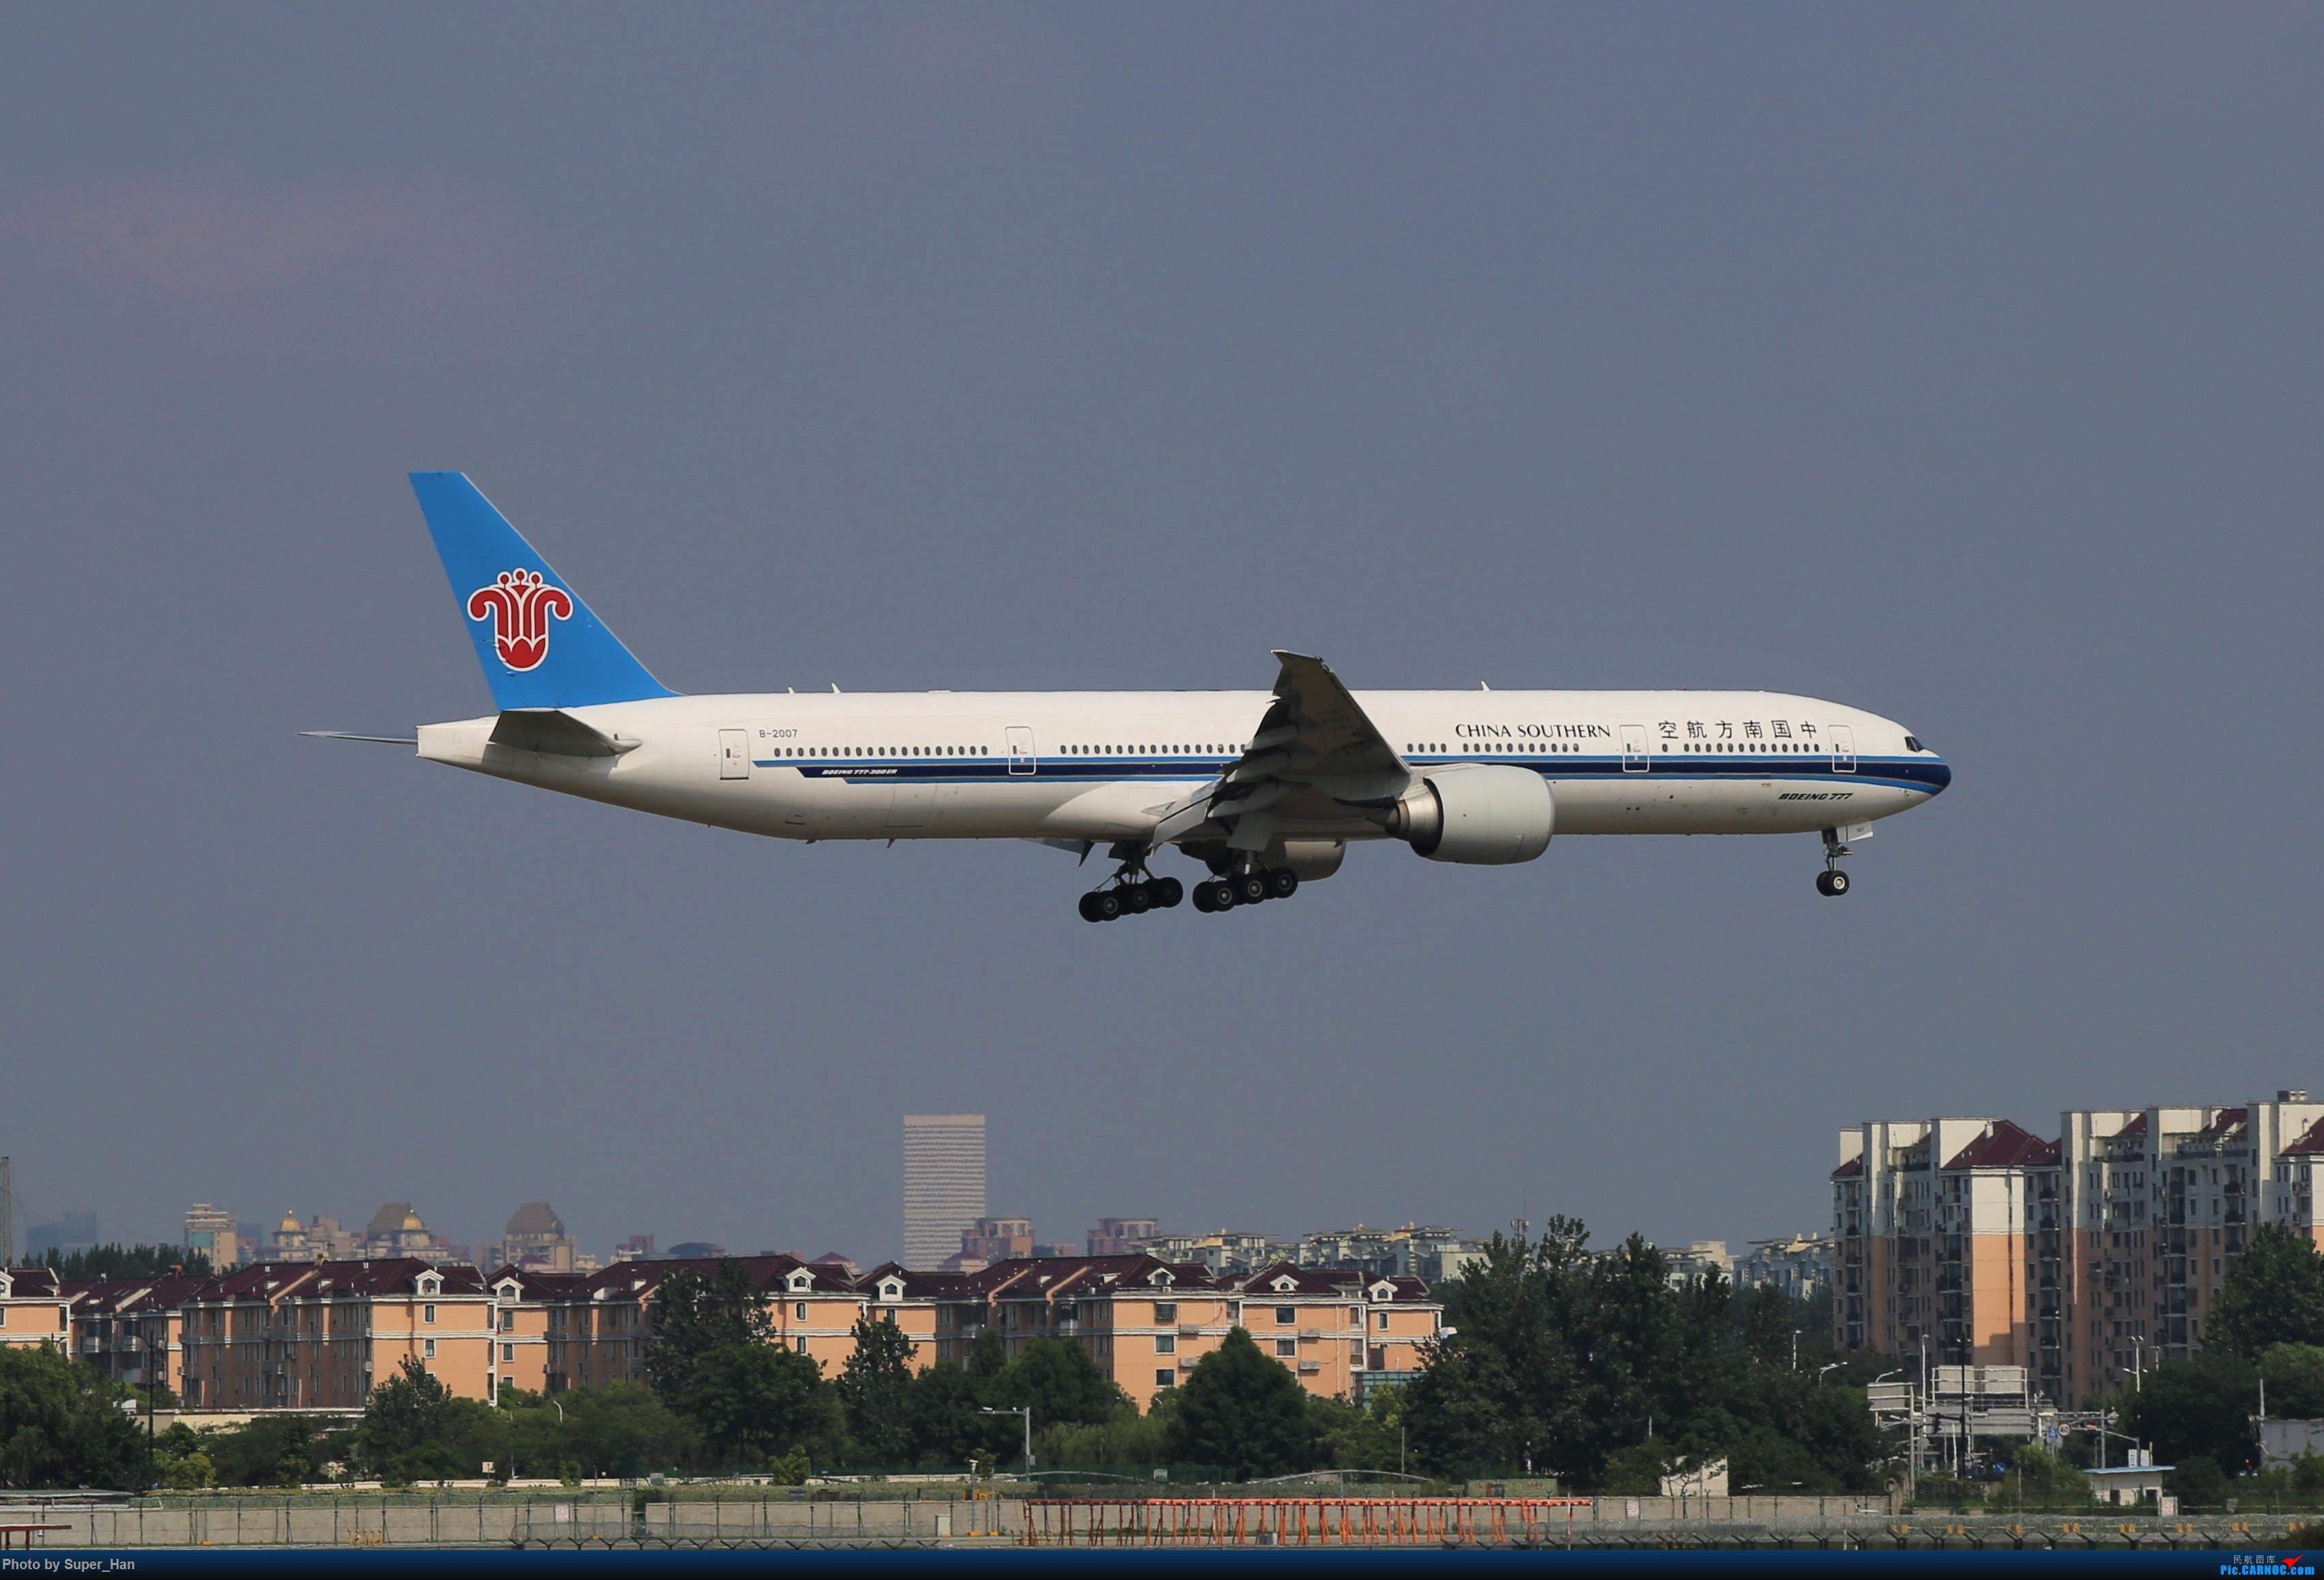 Re:[原创]【杭州飞友会】0715去虹桥说走就走【777篇】 BOEING 777-300ER B-2007 中国上海虹桥国际机场